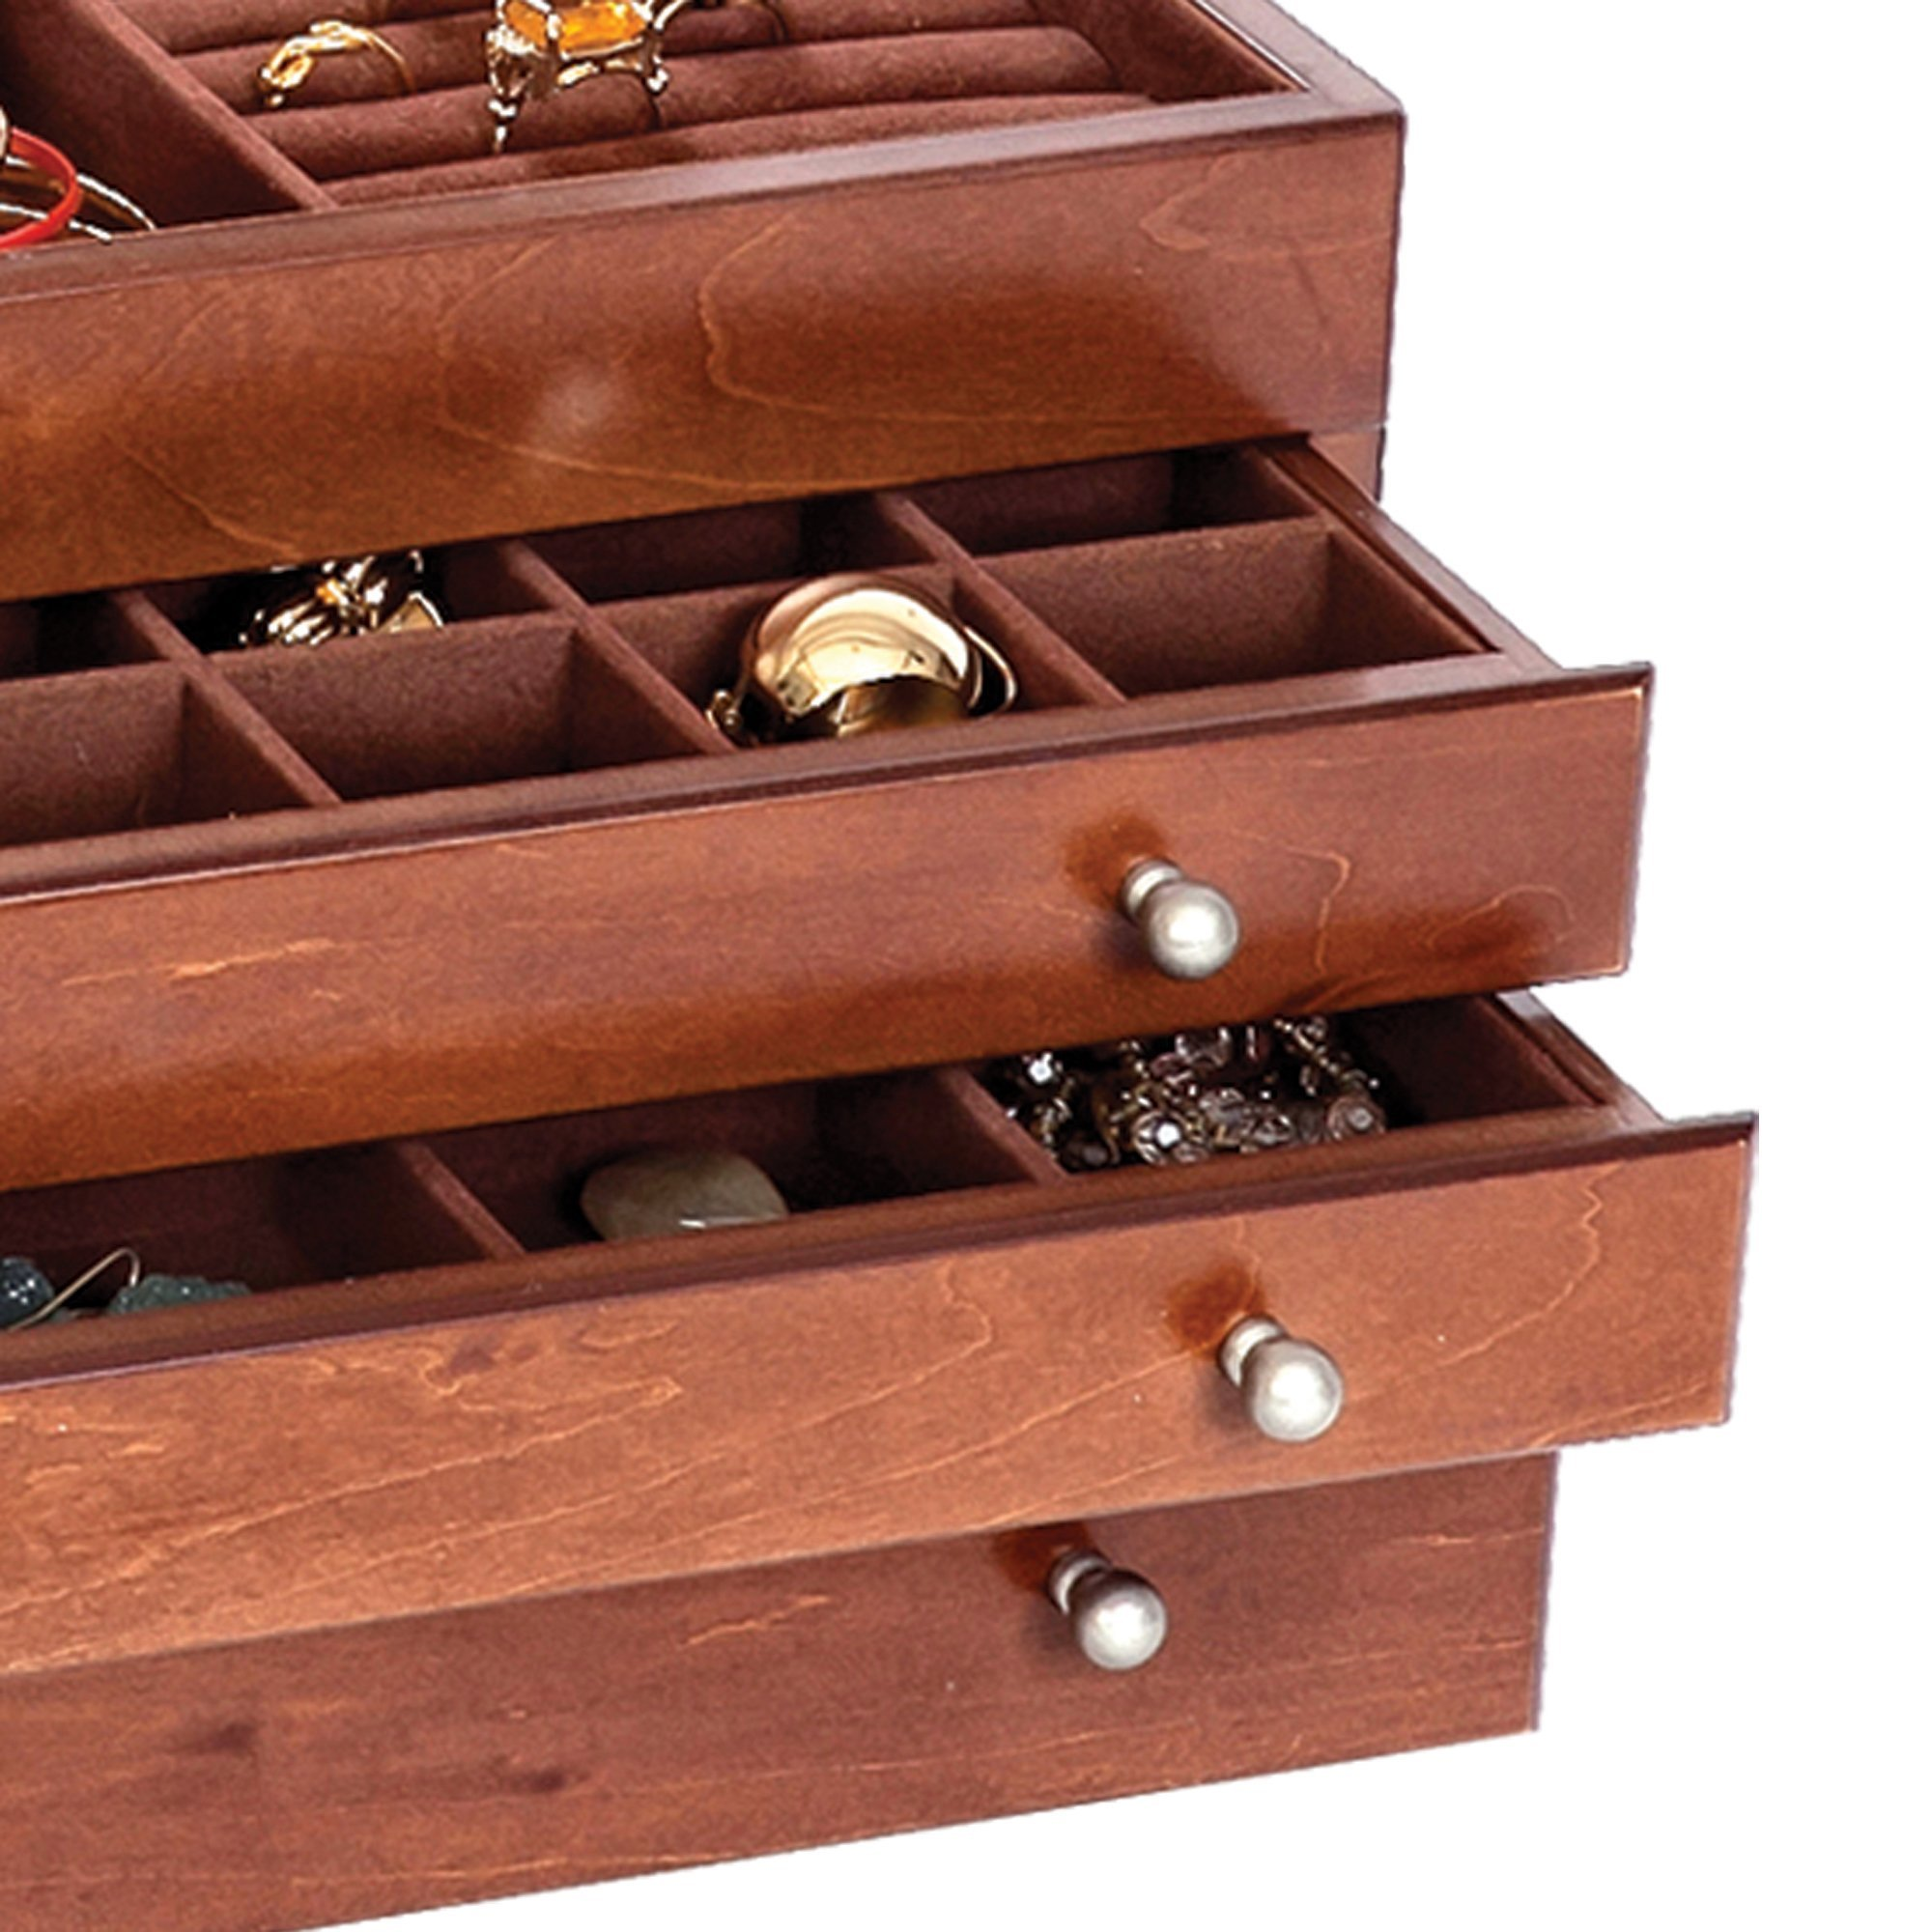 Mele & Co Brigitte Wooden Jewelry Box by Mele & Co. (Image #4)